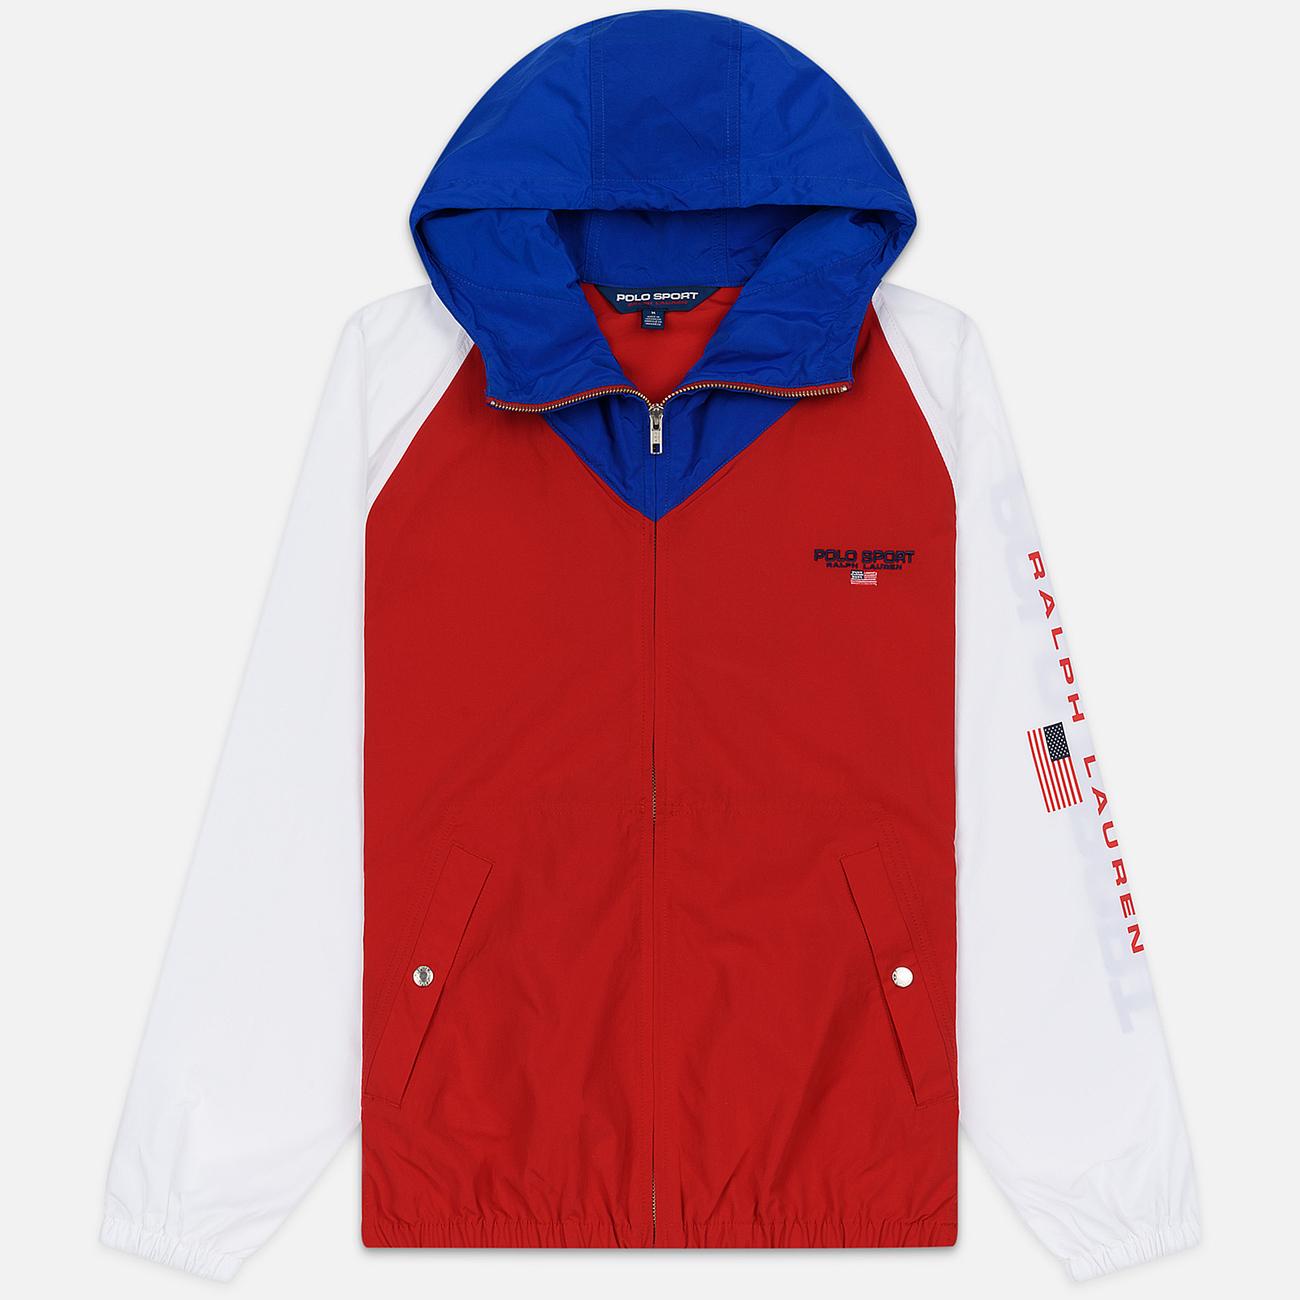 Мужская куртка Polo Ralph Lauren Color Block Windbreaker Red/White/Sapphire Star